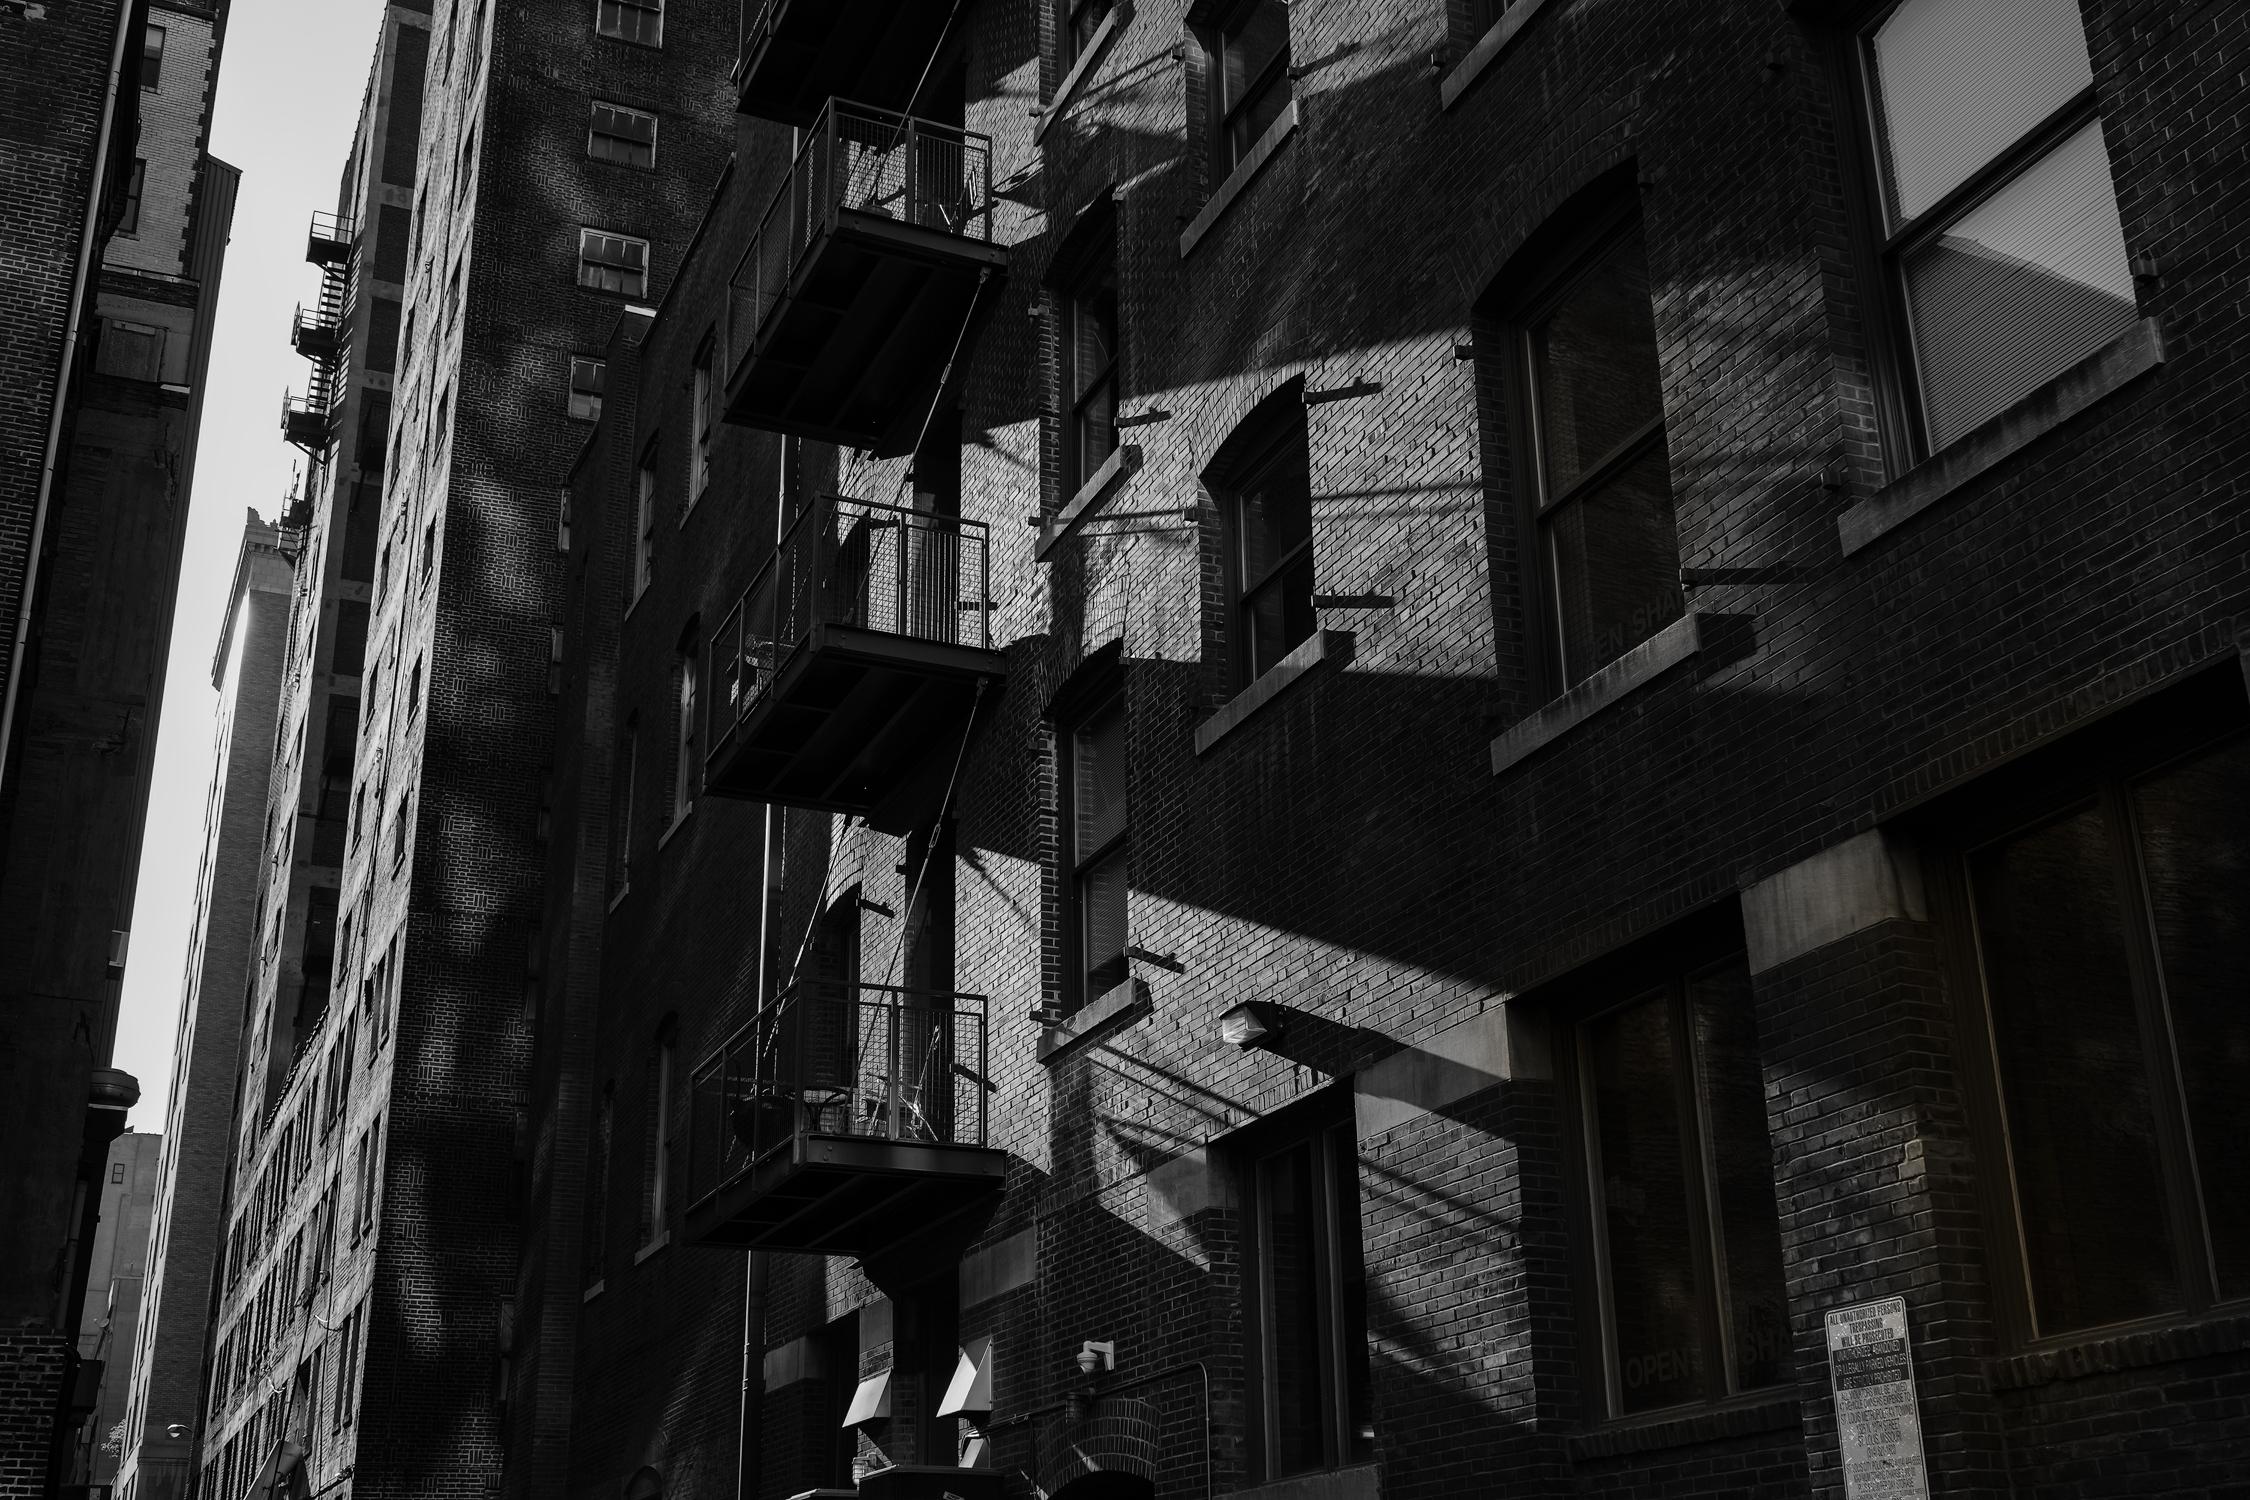 Sunlight through an open slot casts shadows on a brick facade. Fuji X-Pro 2 and a Fujinon 16-55mm f2.8.